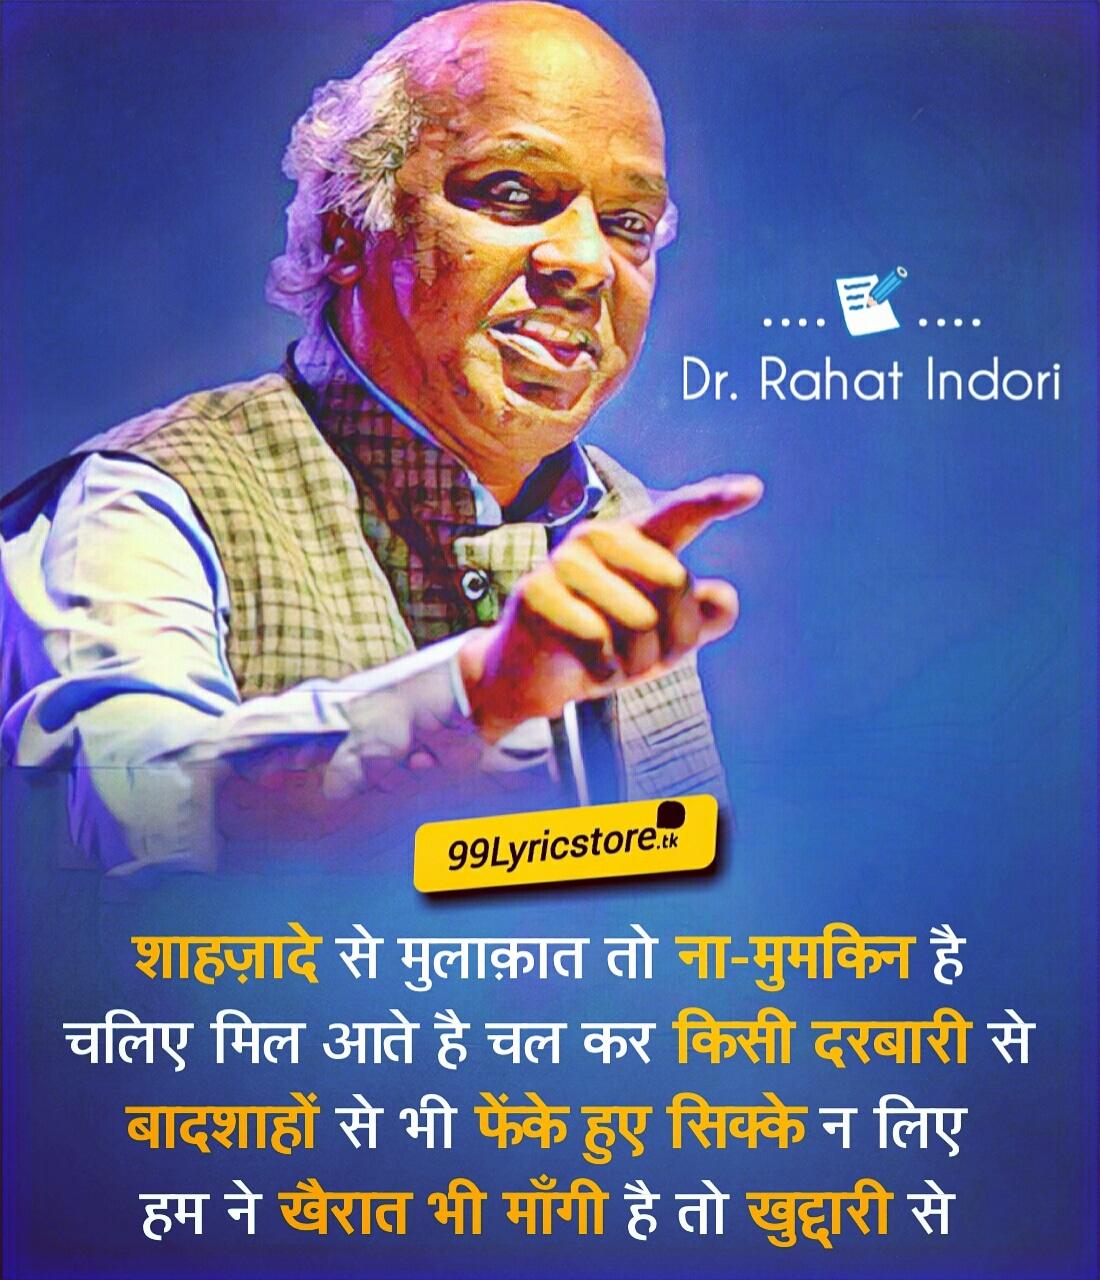 Jaa Ke Ye Kah De Koi Sholon Se Chingari Se written and performed by Rahat Indori, this poetry is best Shayari and Ghazal of Rahat Indori.